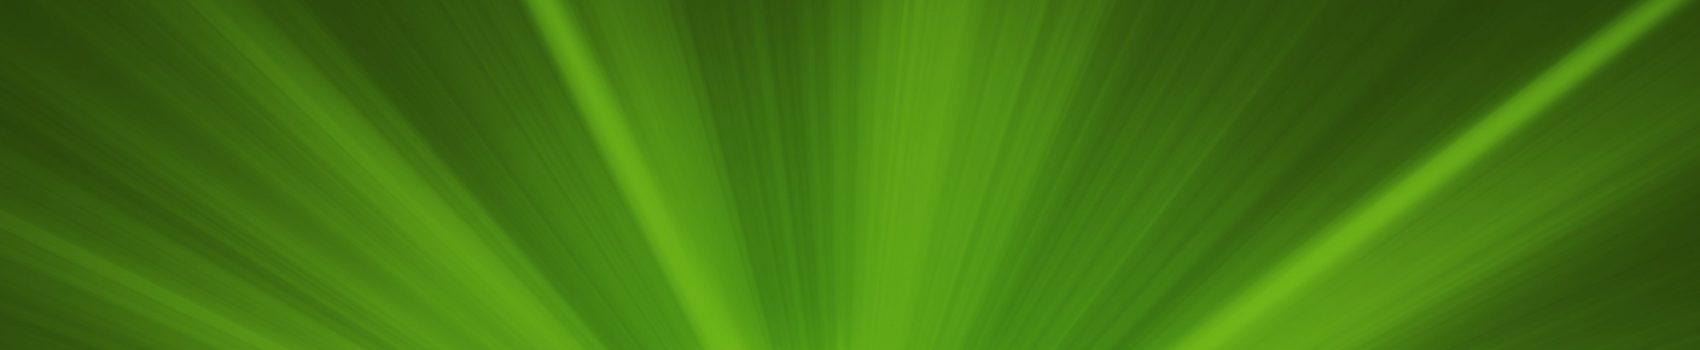 groen stralen 3